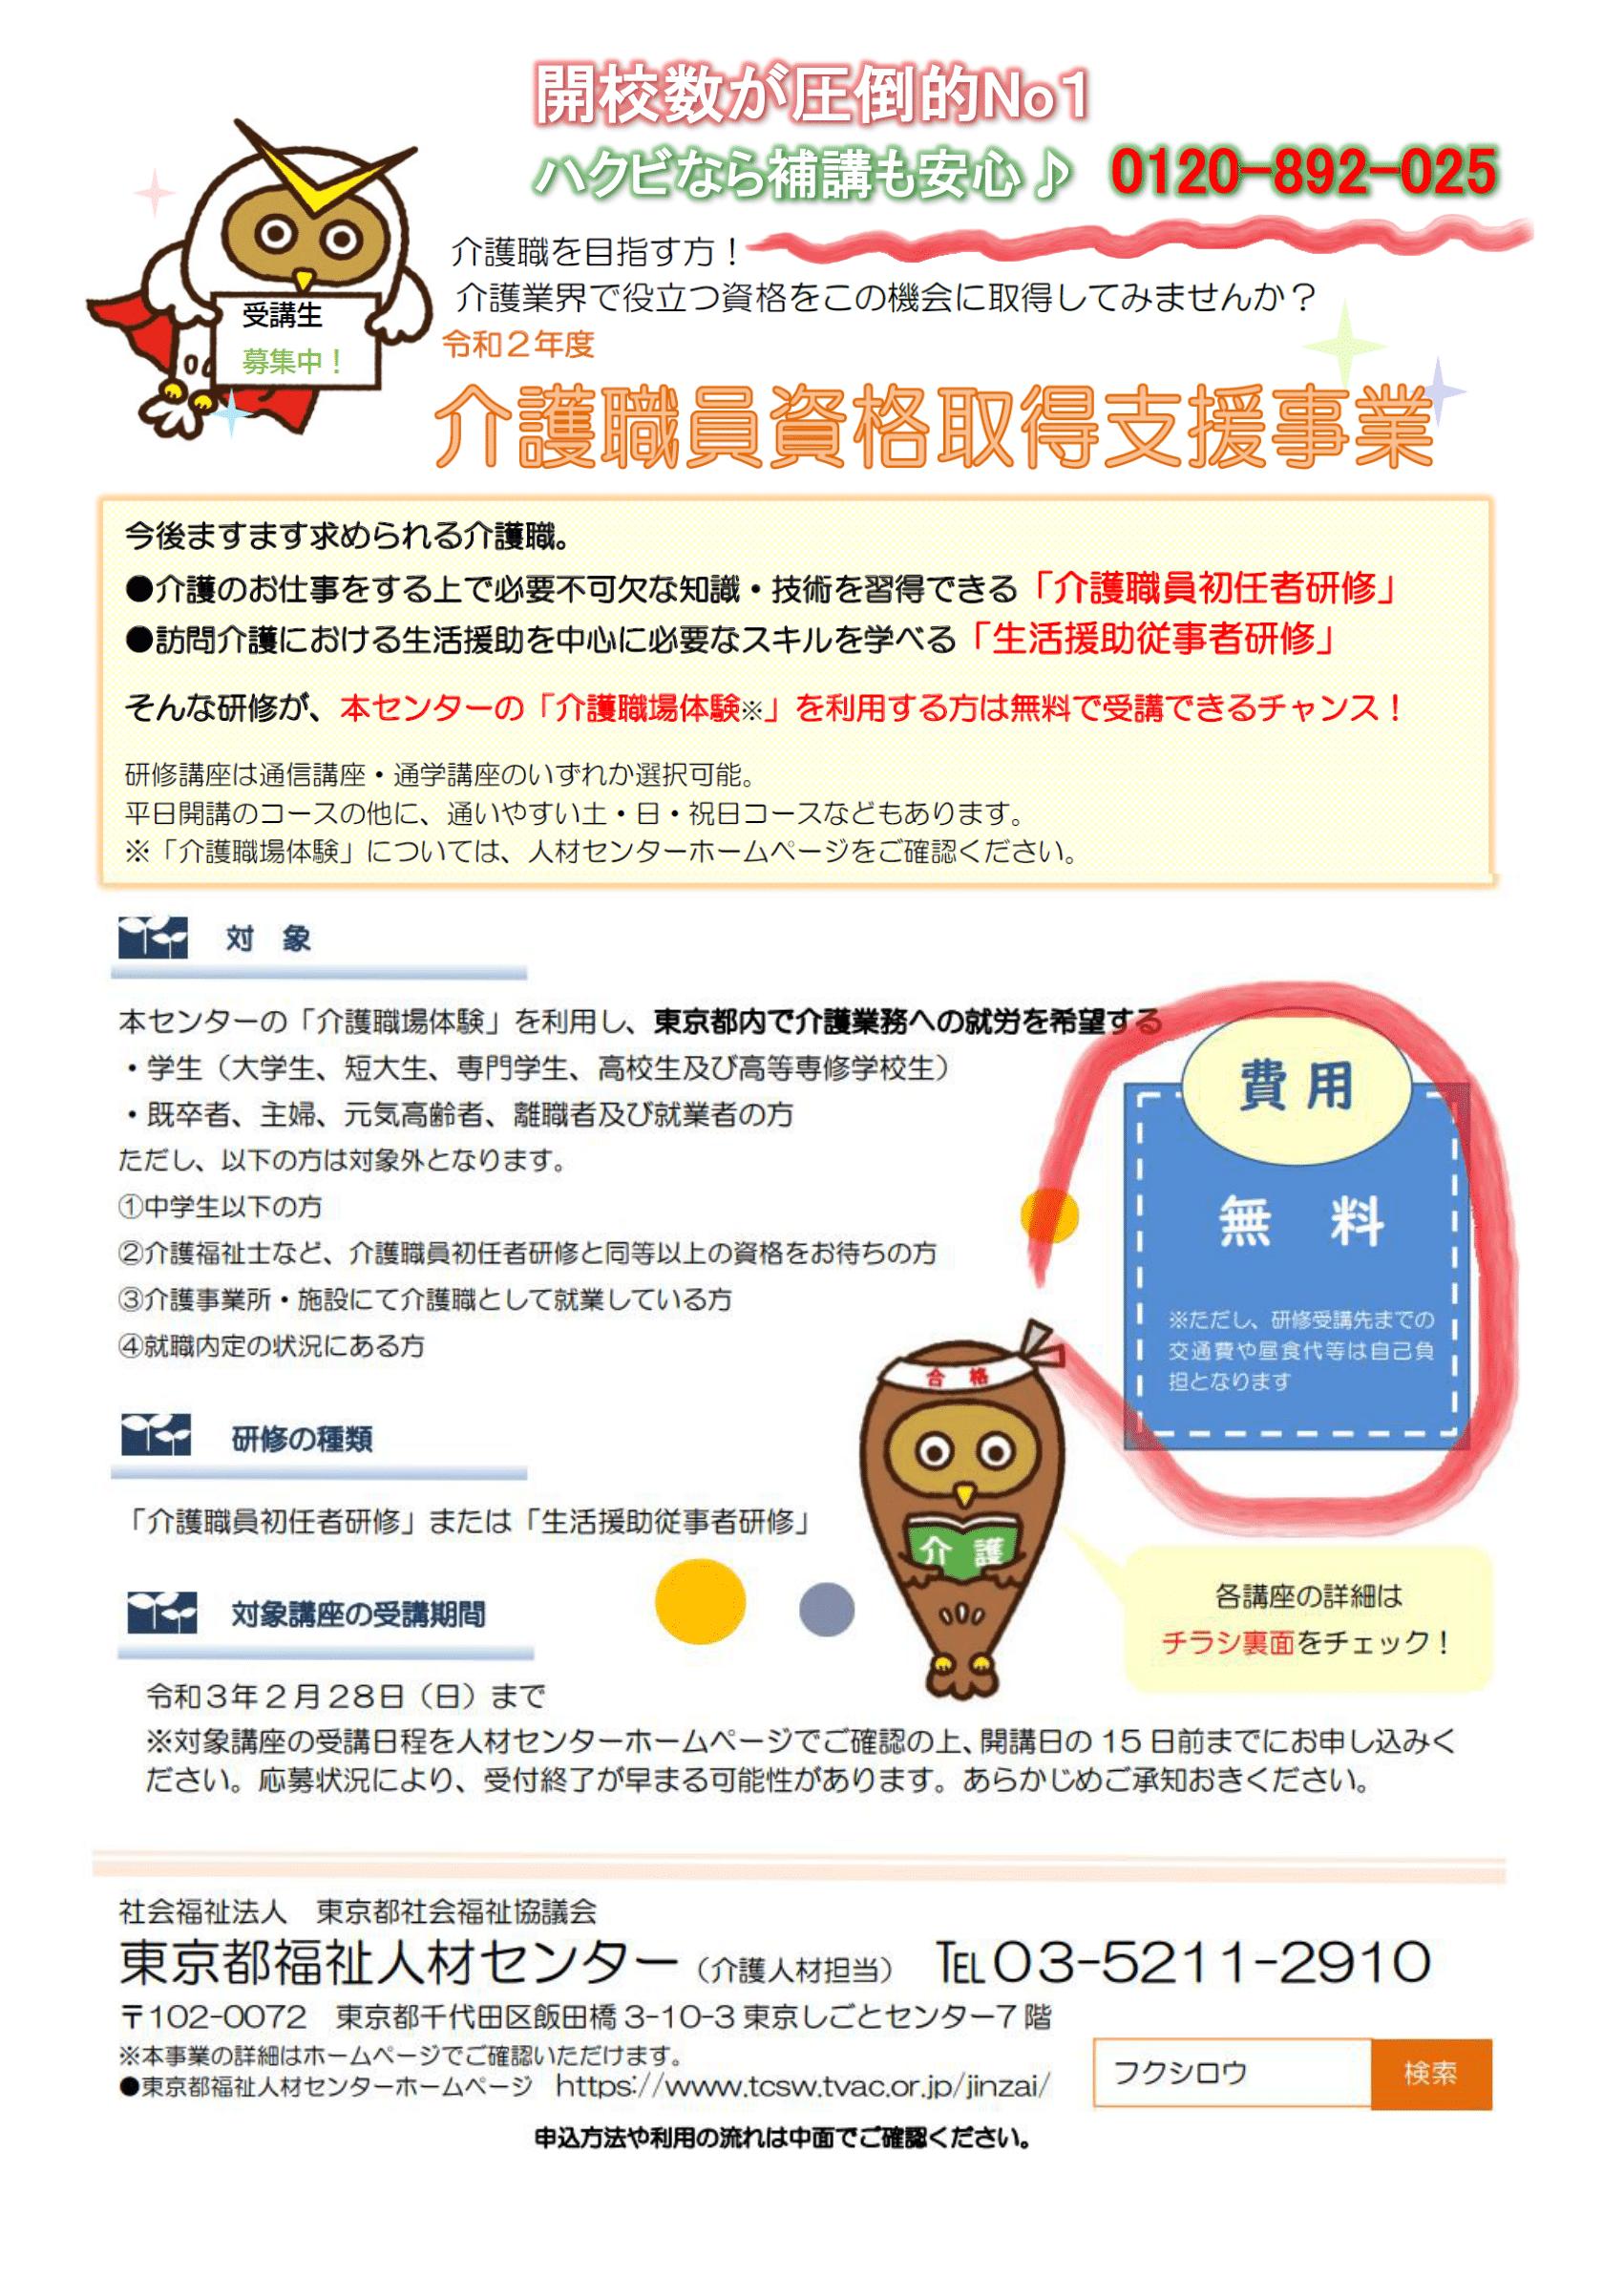 雉・シ蜿門セ玲髪謠エ2020縲€・匁椢-1